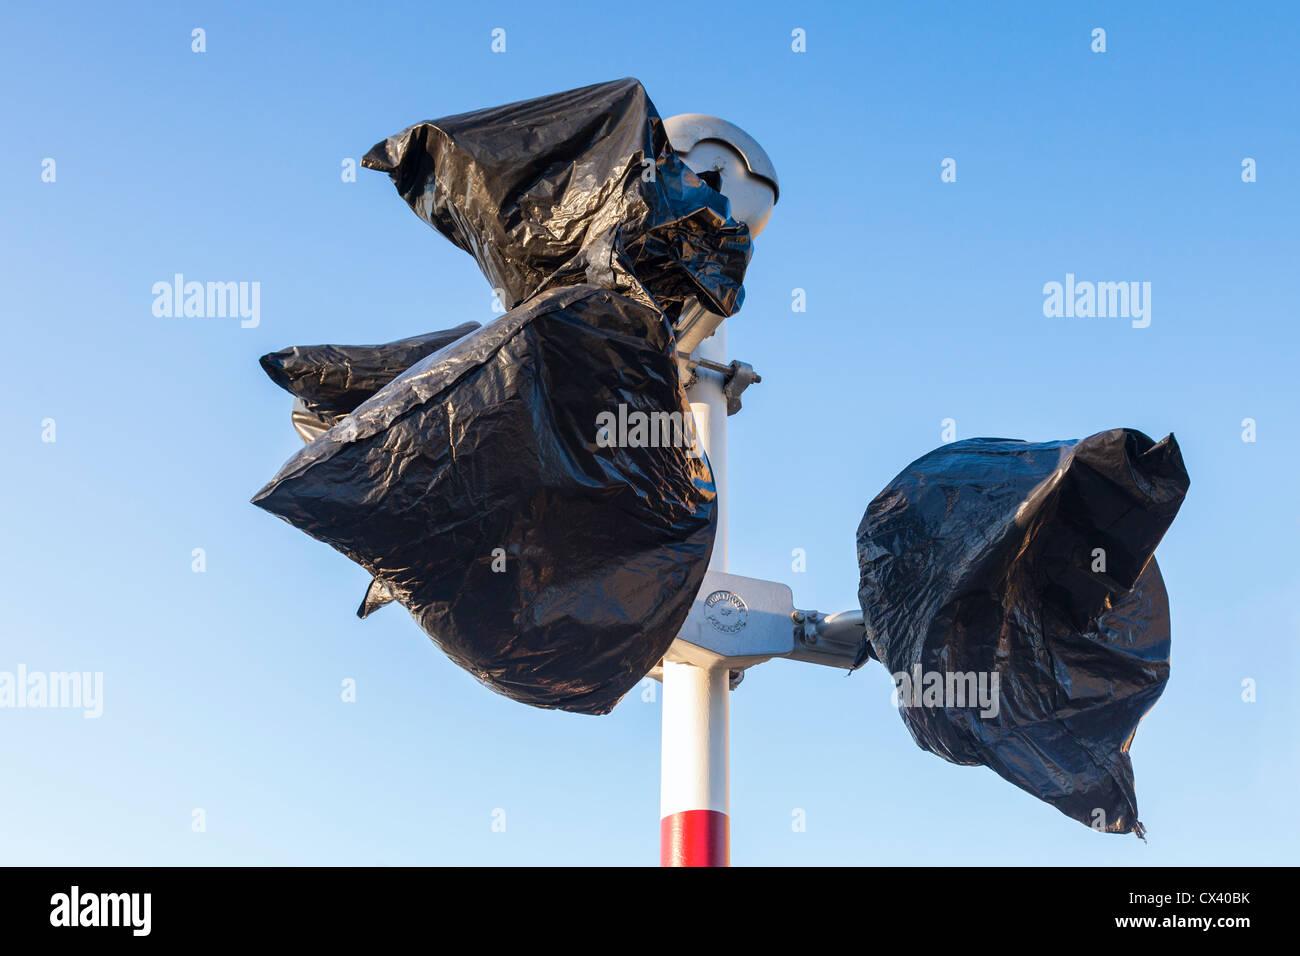 Paso a nivel de luces de advertencia, cubierto con bolsas de papelera de plástico negro. Imagen De Stock